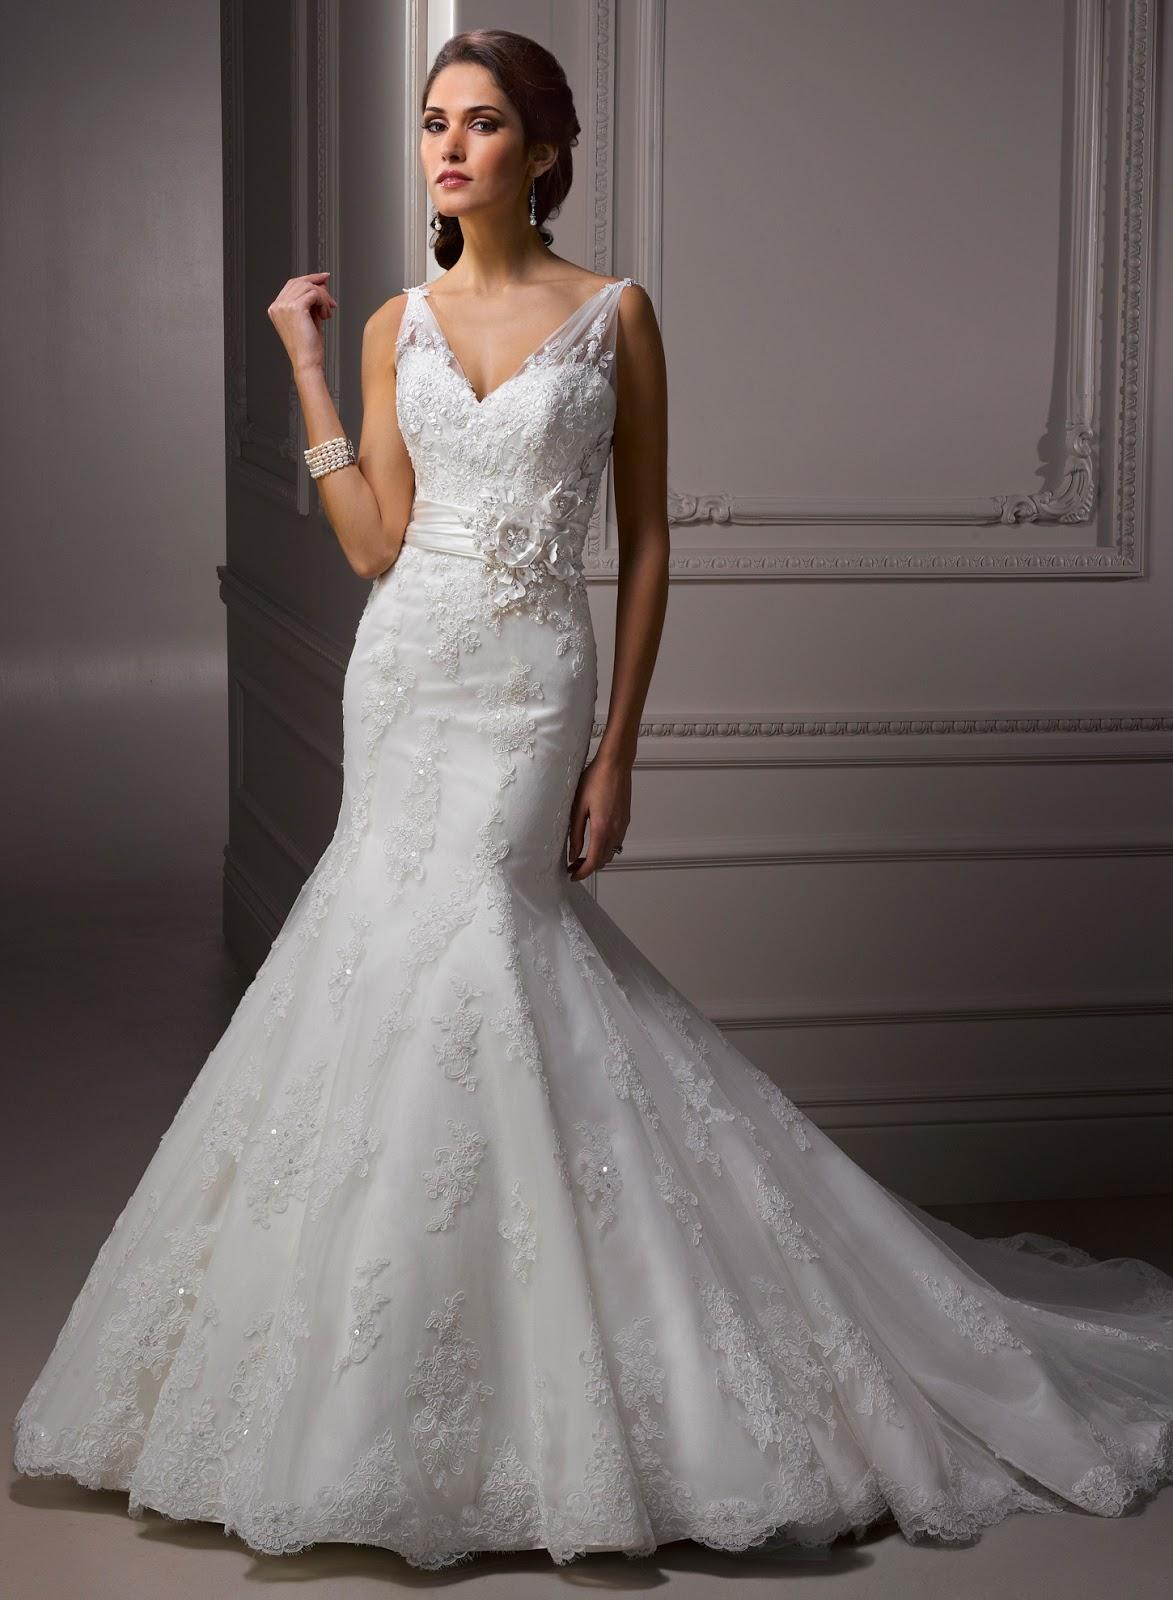 Fashion & Make Up: 66 types of wedding dresses